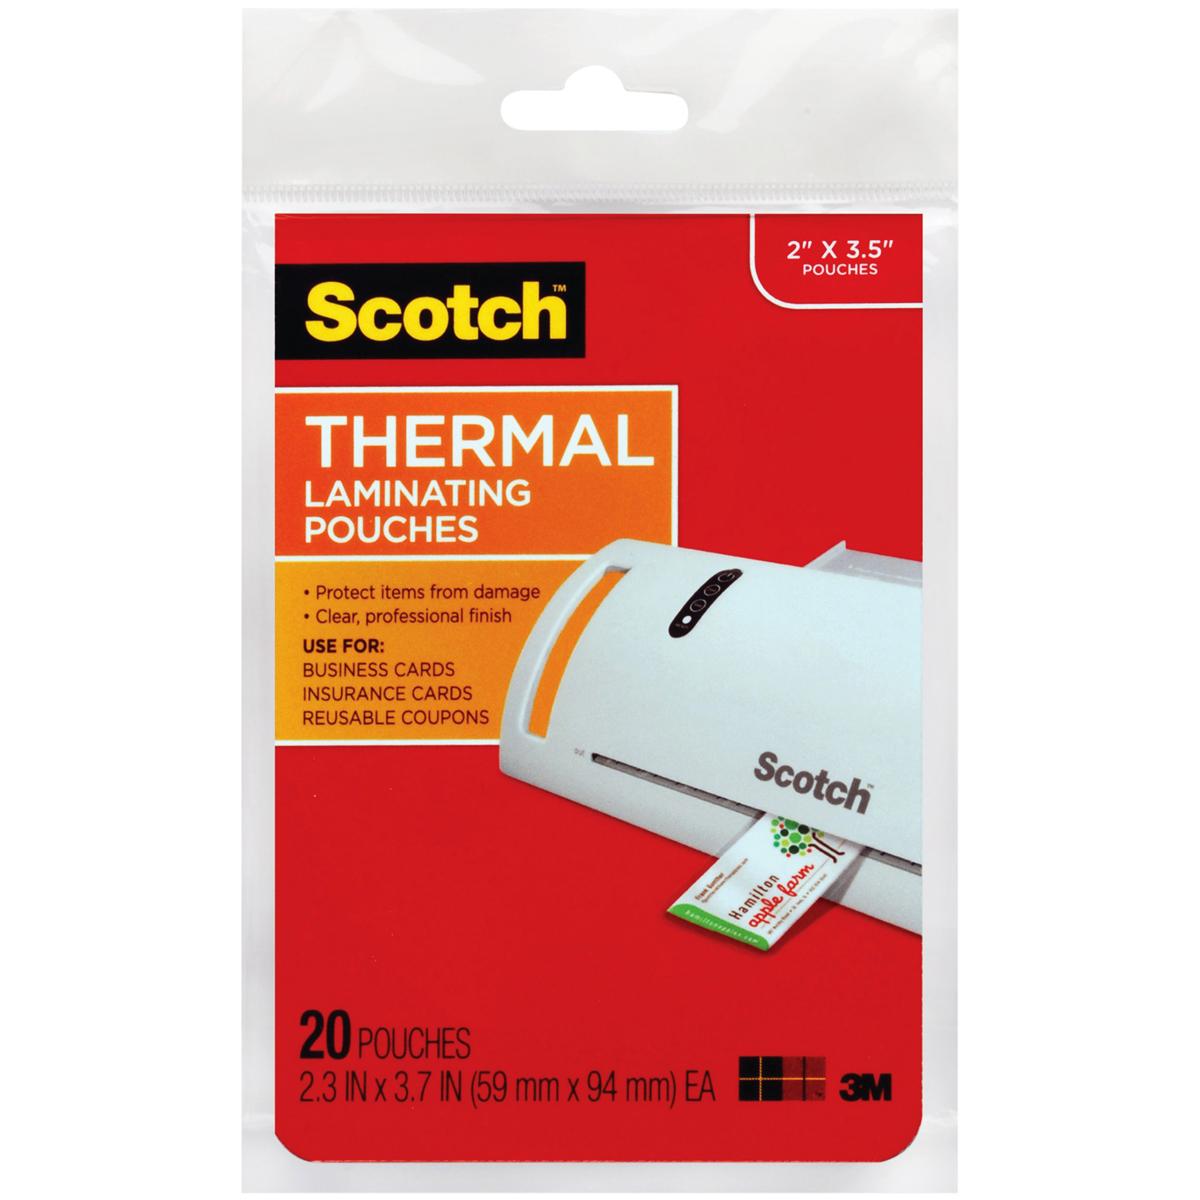 Scotch Laminating Business Card Pouches - 20pc